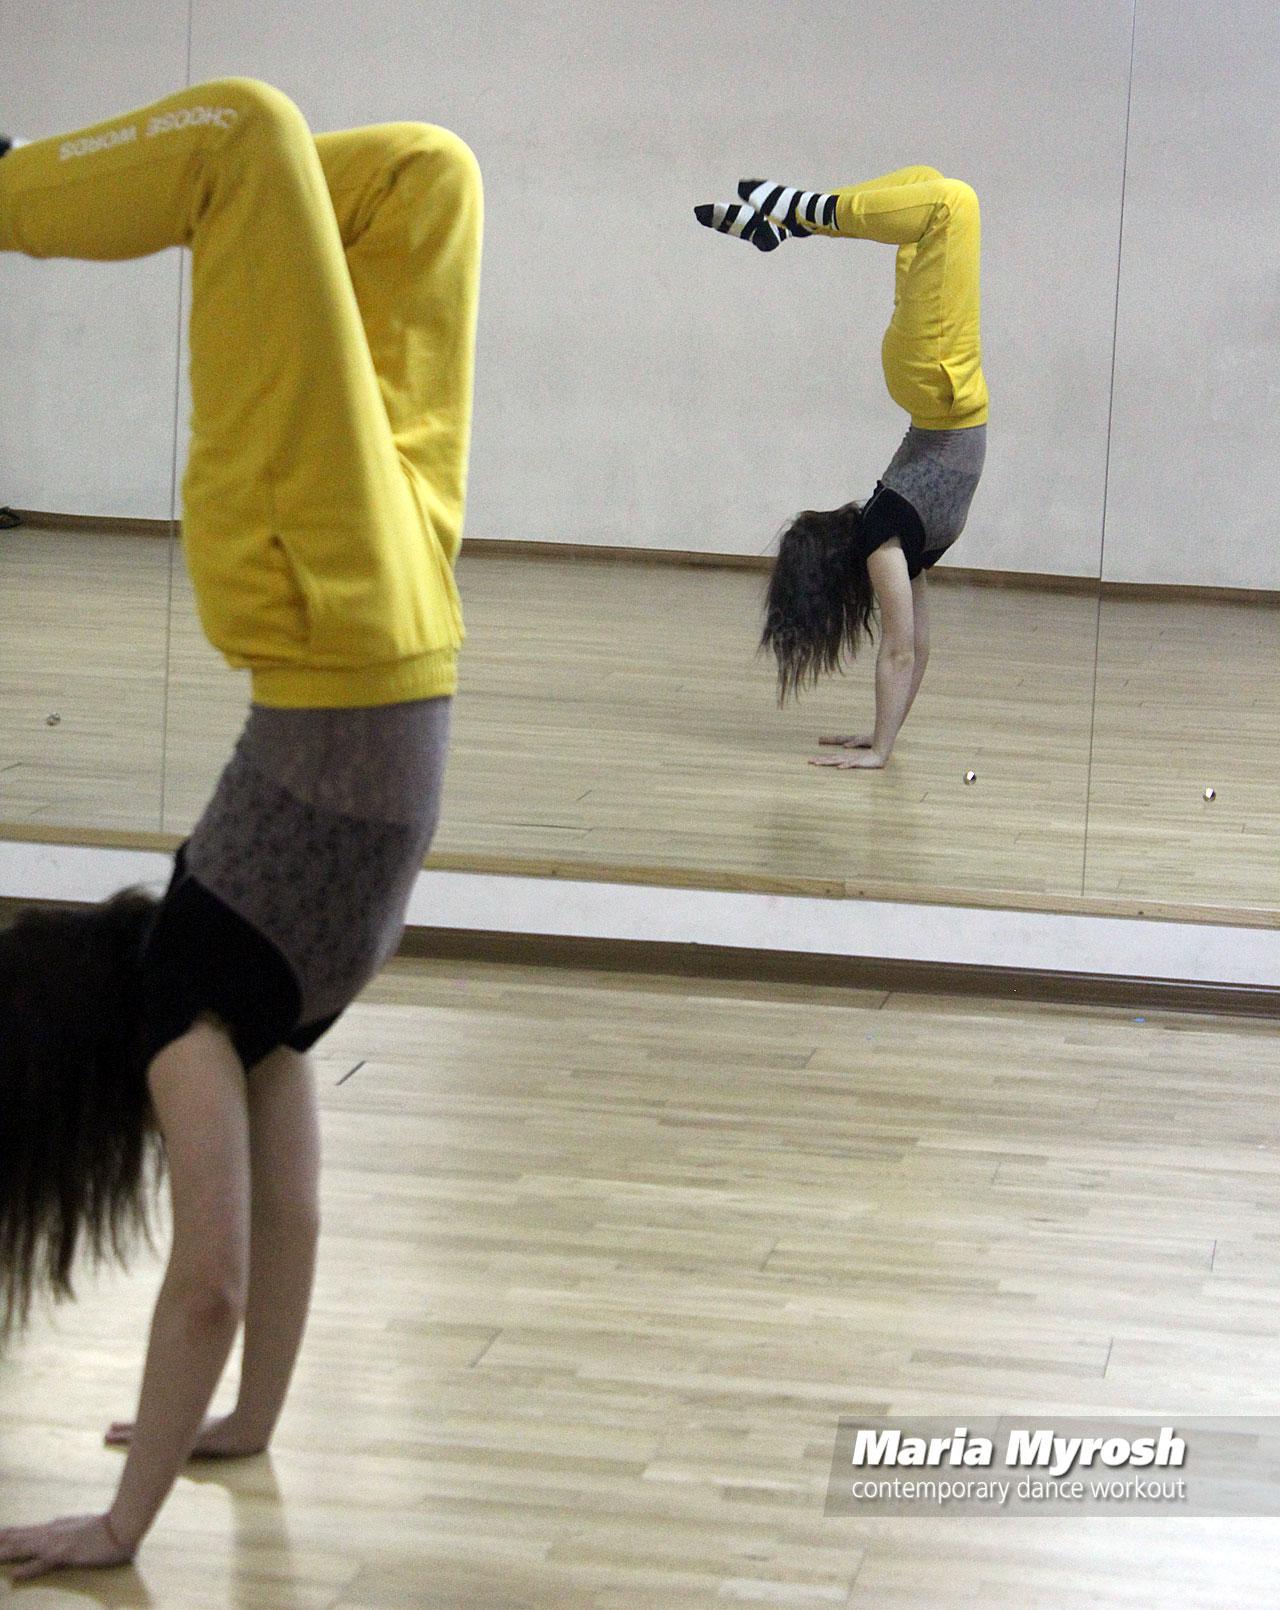 Maria Myrosh contemporary dance workout